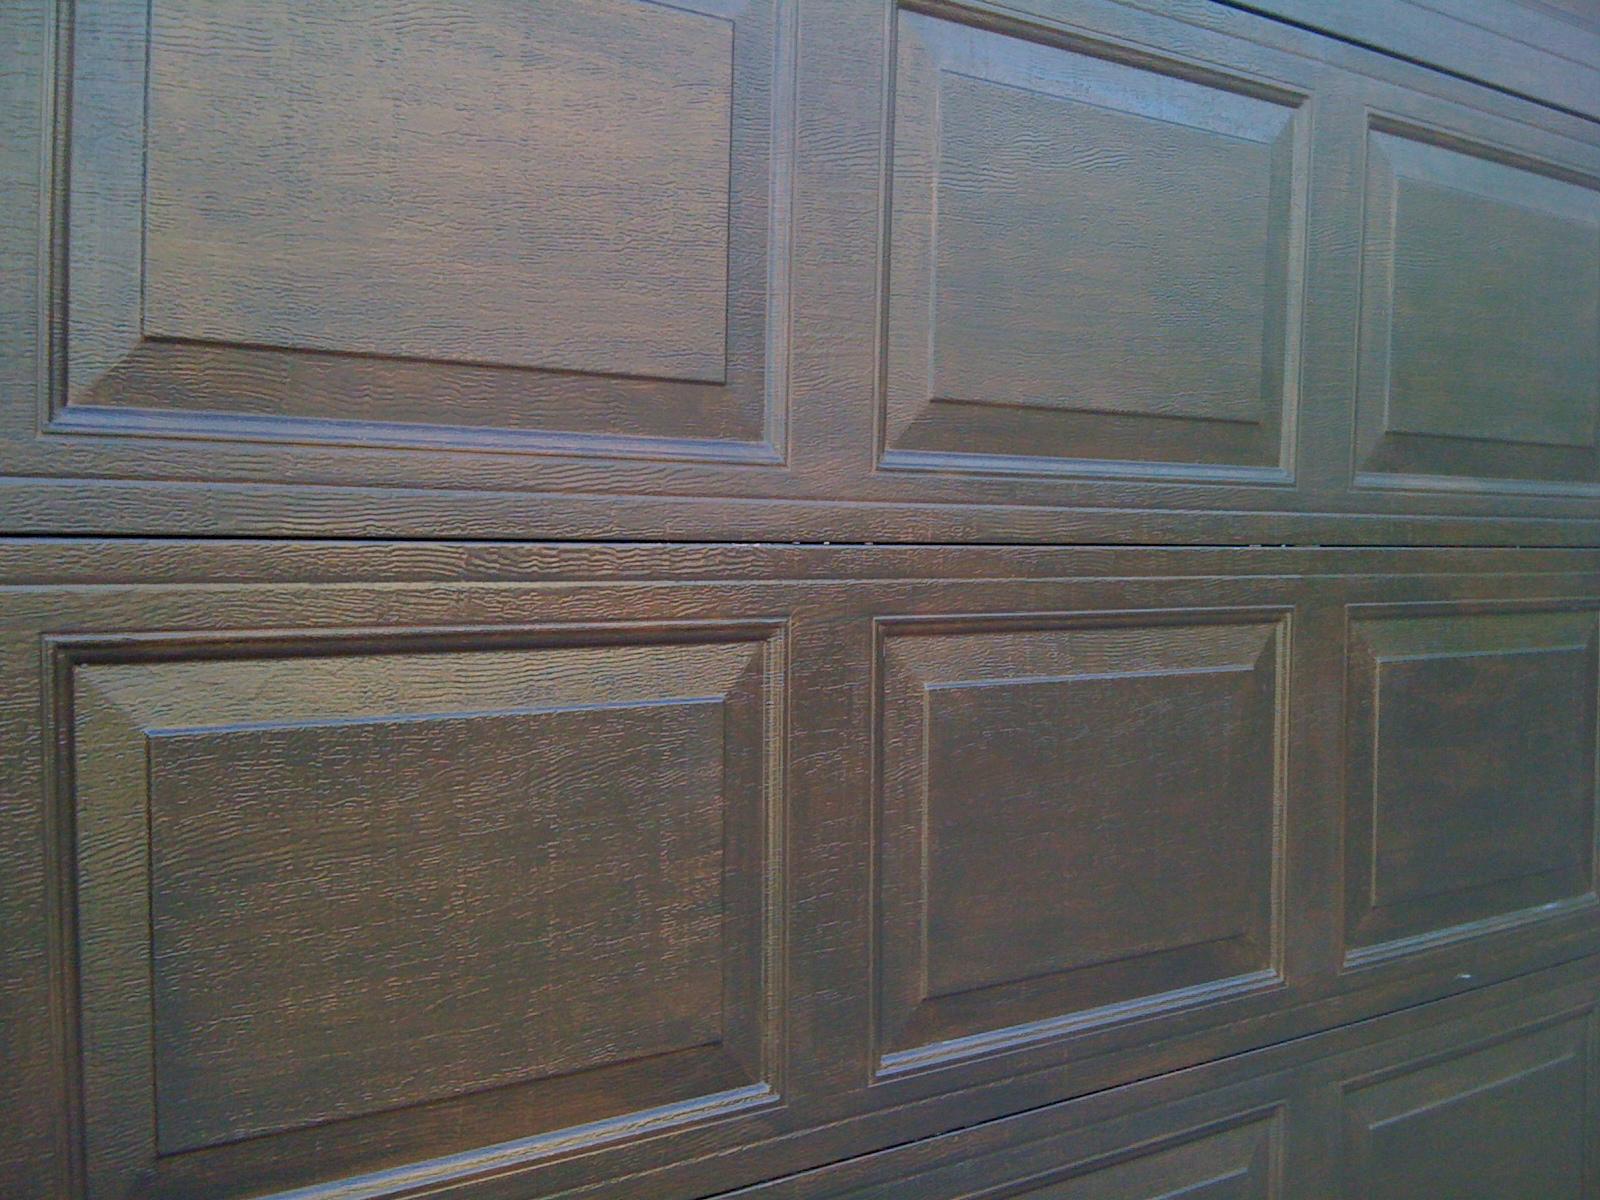 wilde mount wall residential liftmaster introduces pdf new door february garage opener joe